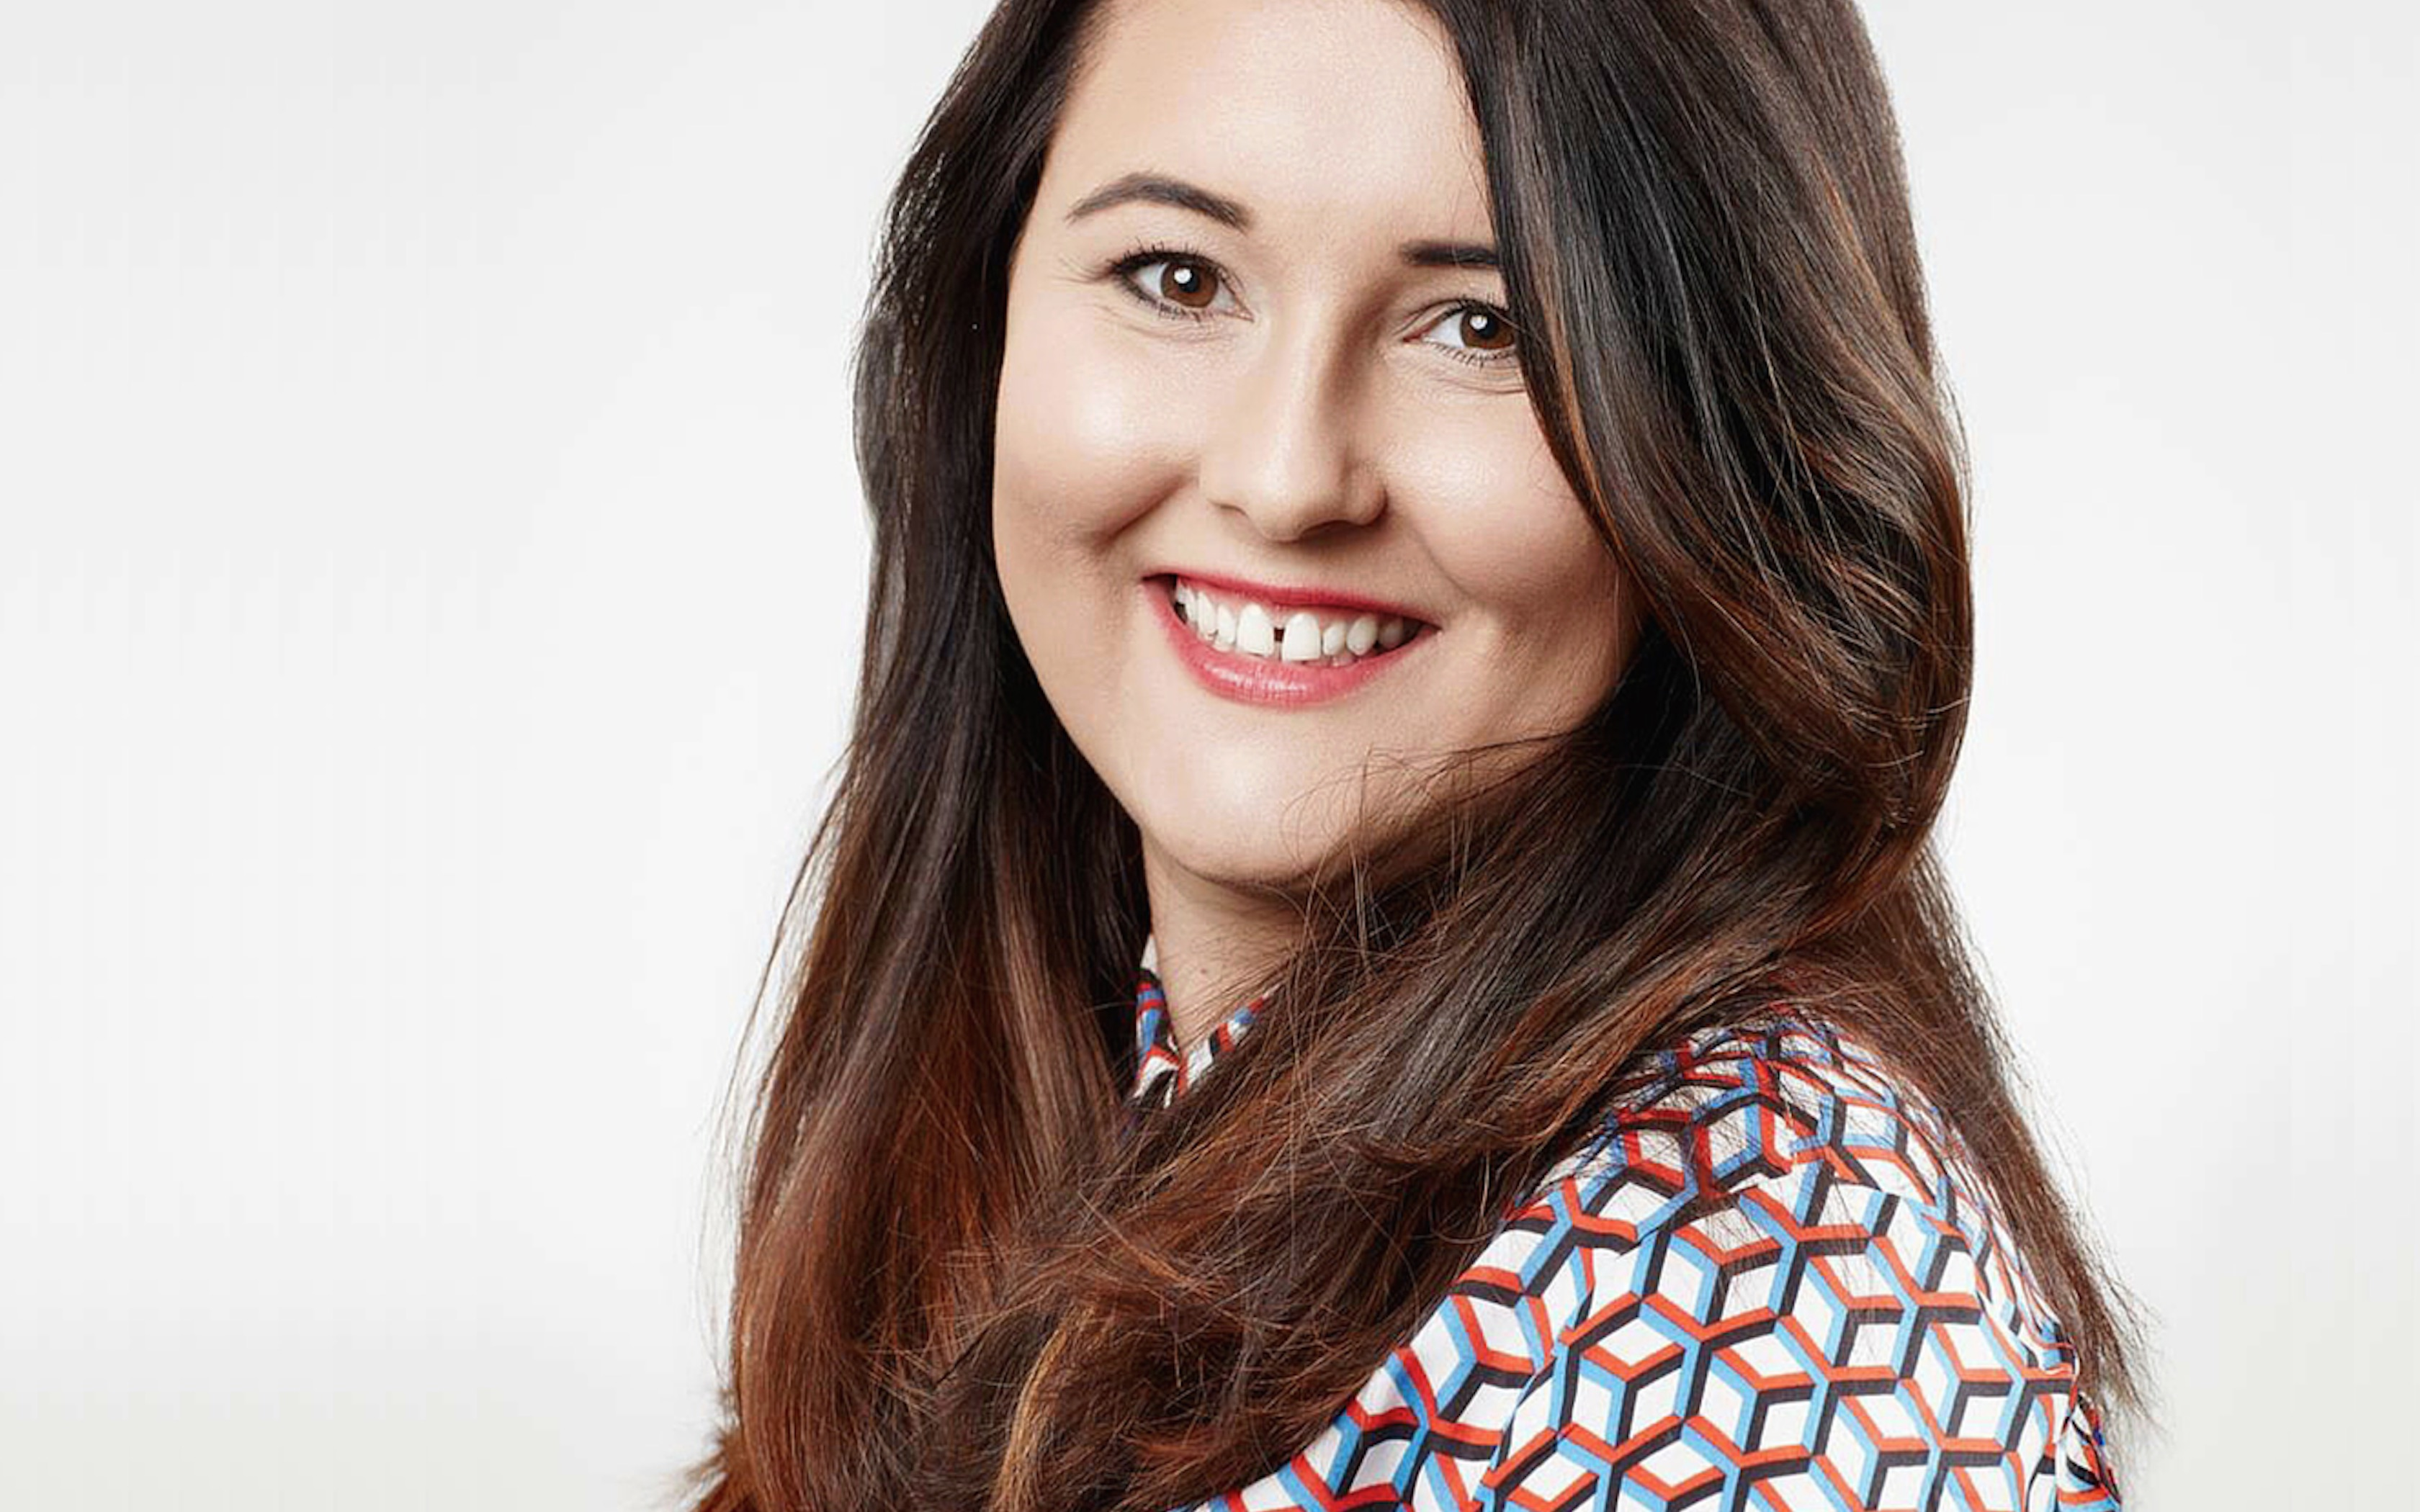 INSIGNIA z nowym Social Media Specialist branży fashion Insignia mediarun anna ortman insignia